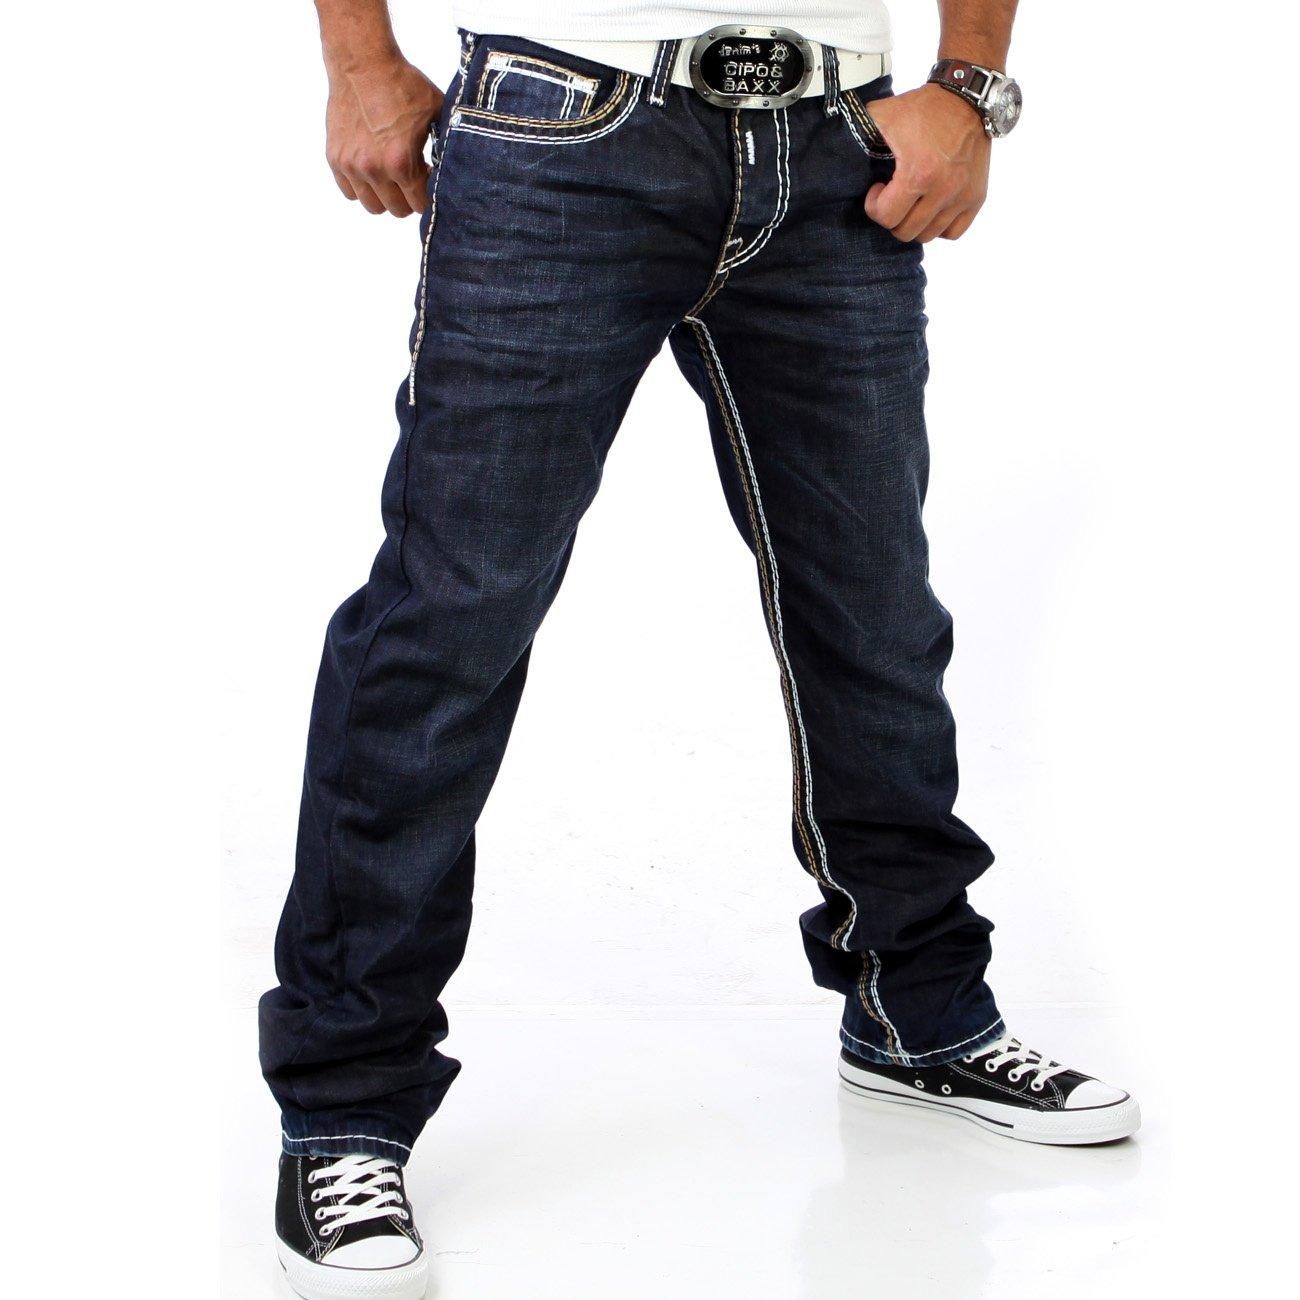 r neal jeans herren blau mit dicke naht 7443 3 g nstig. Black Bedroom Furniture Sets. Home Design Ideas